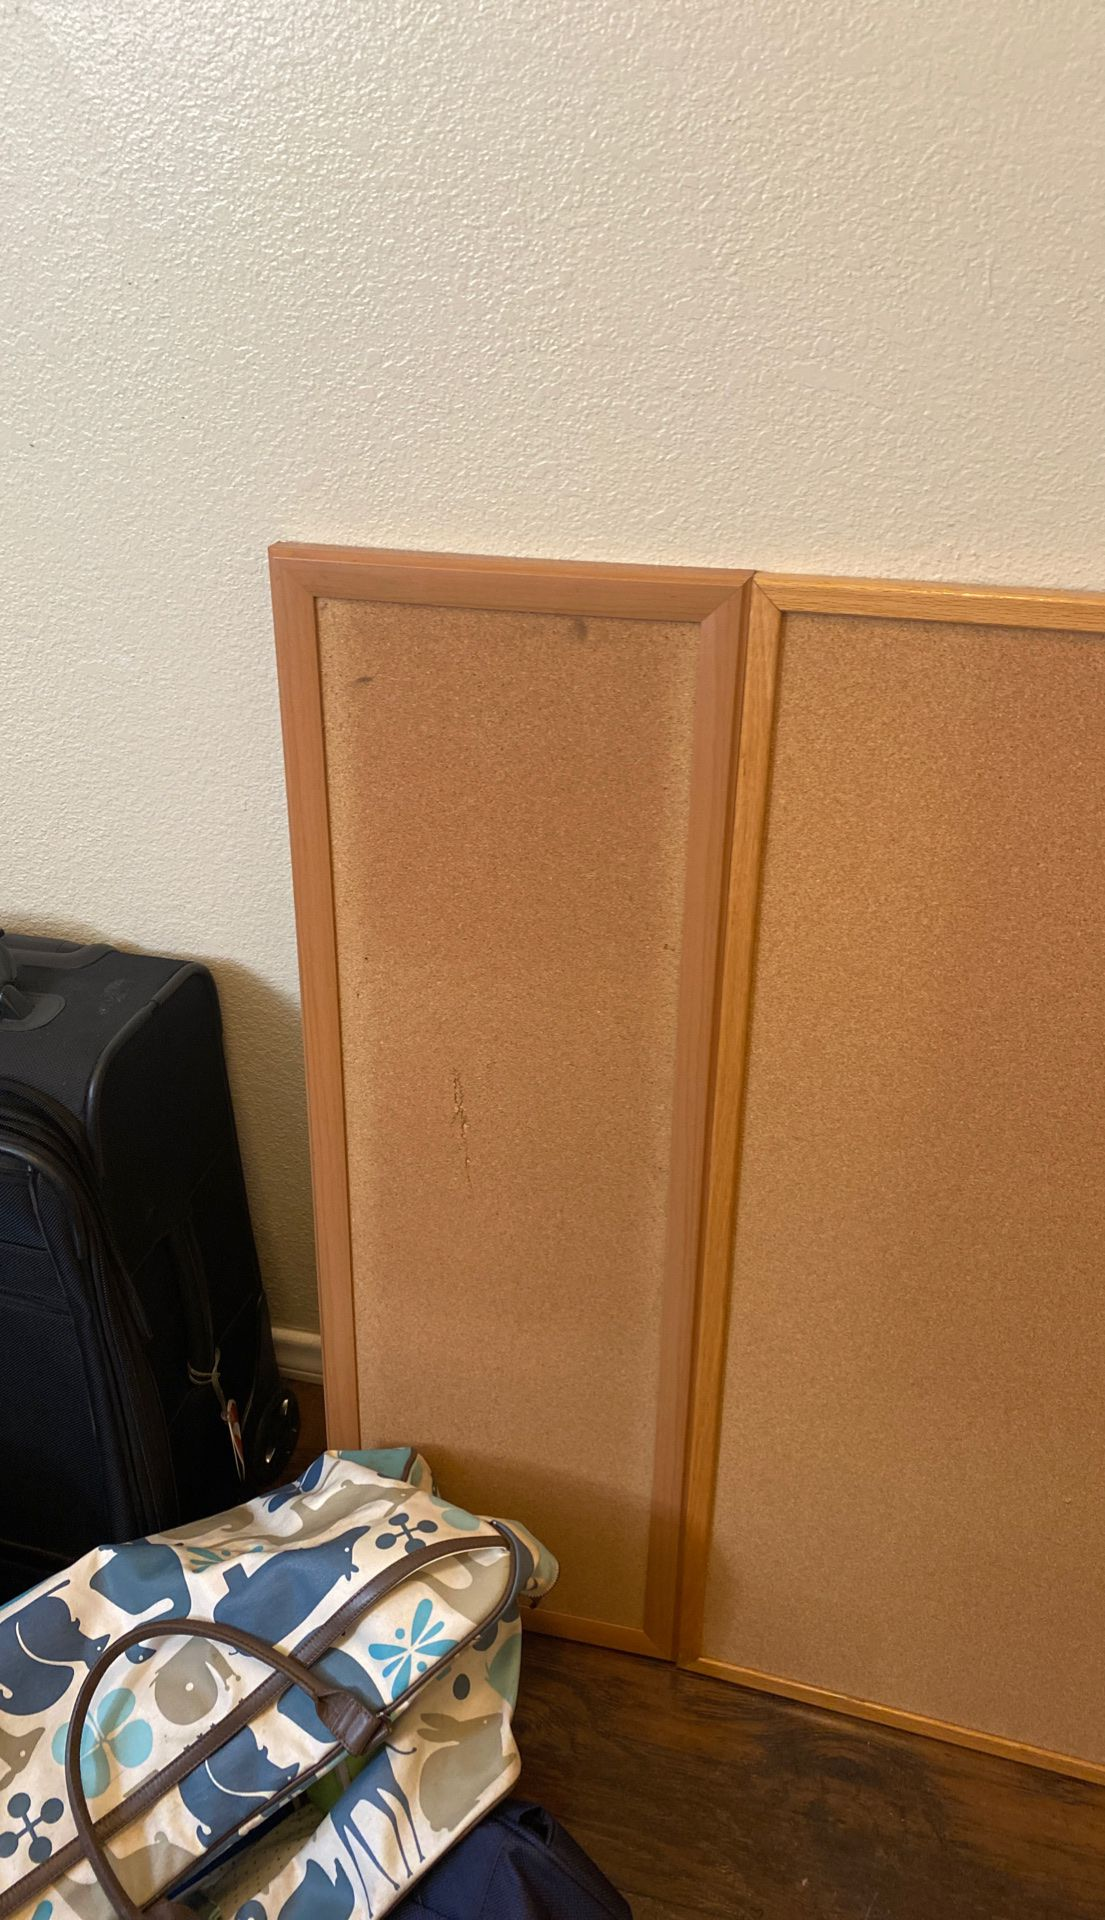 3 cork boards